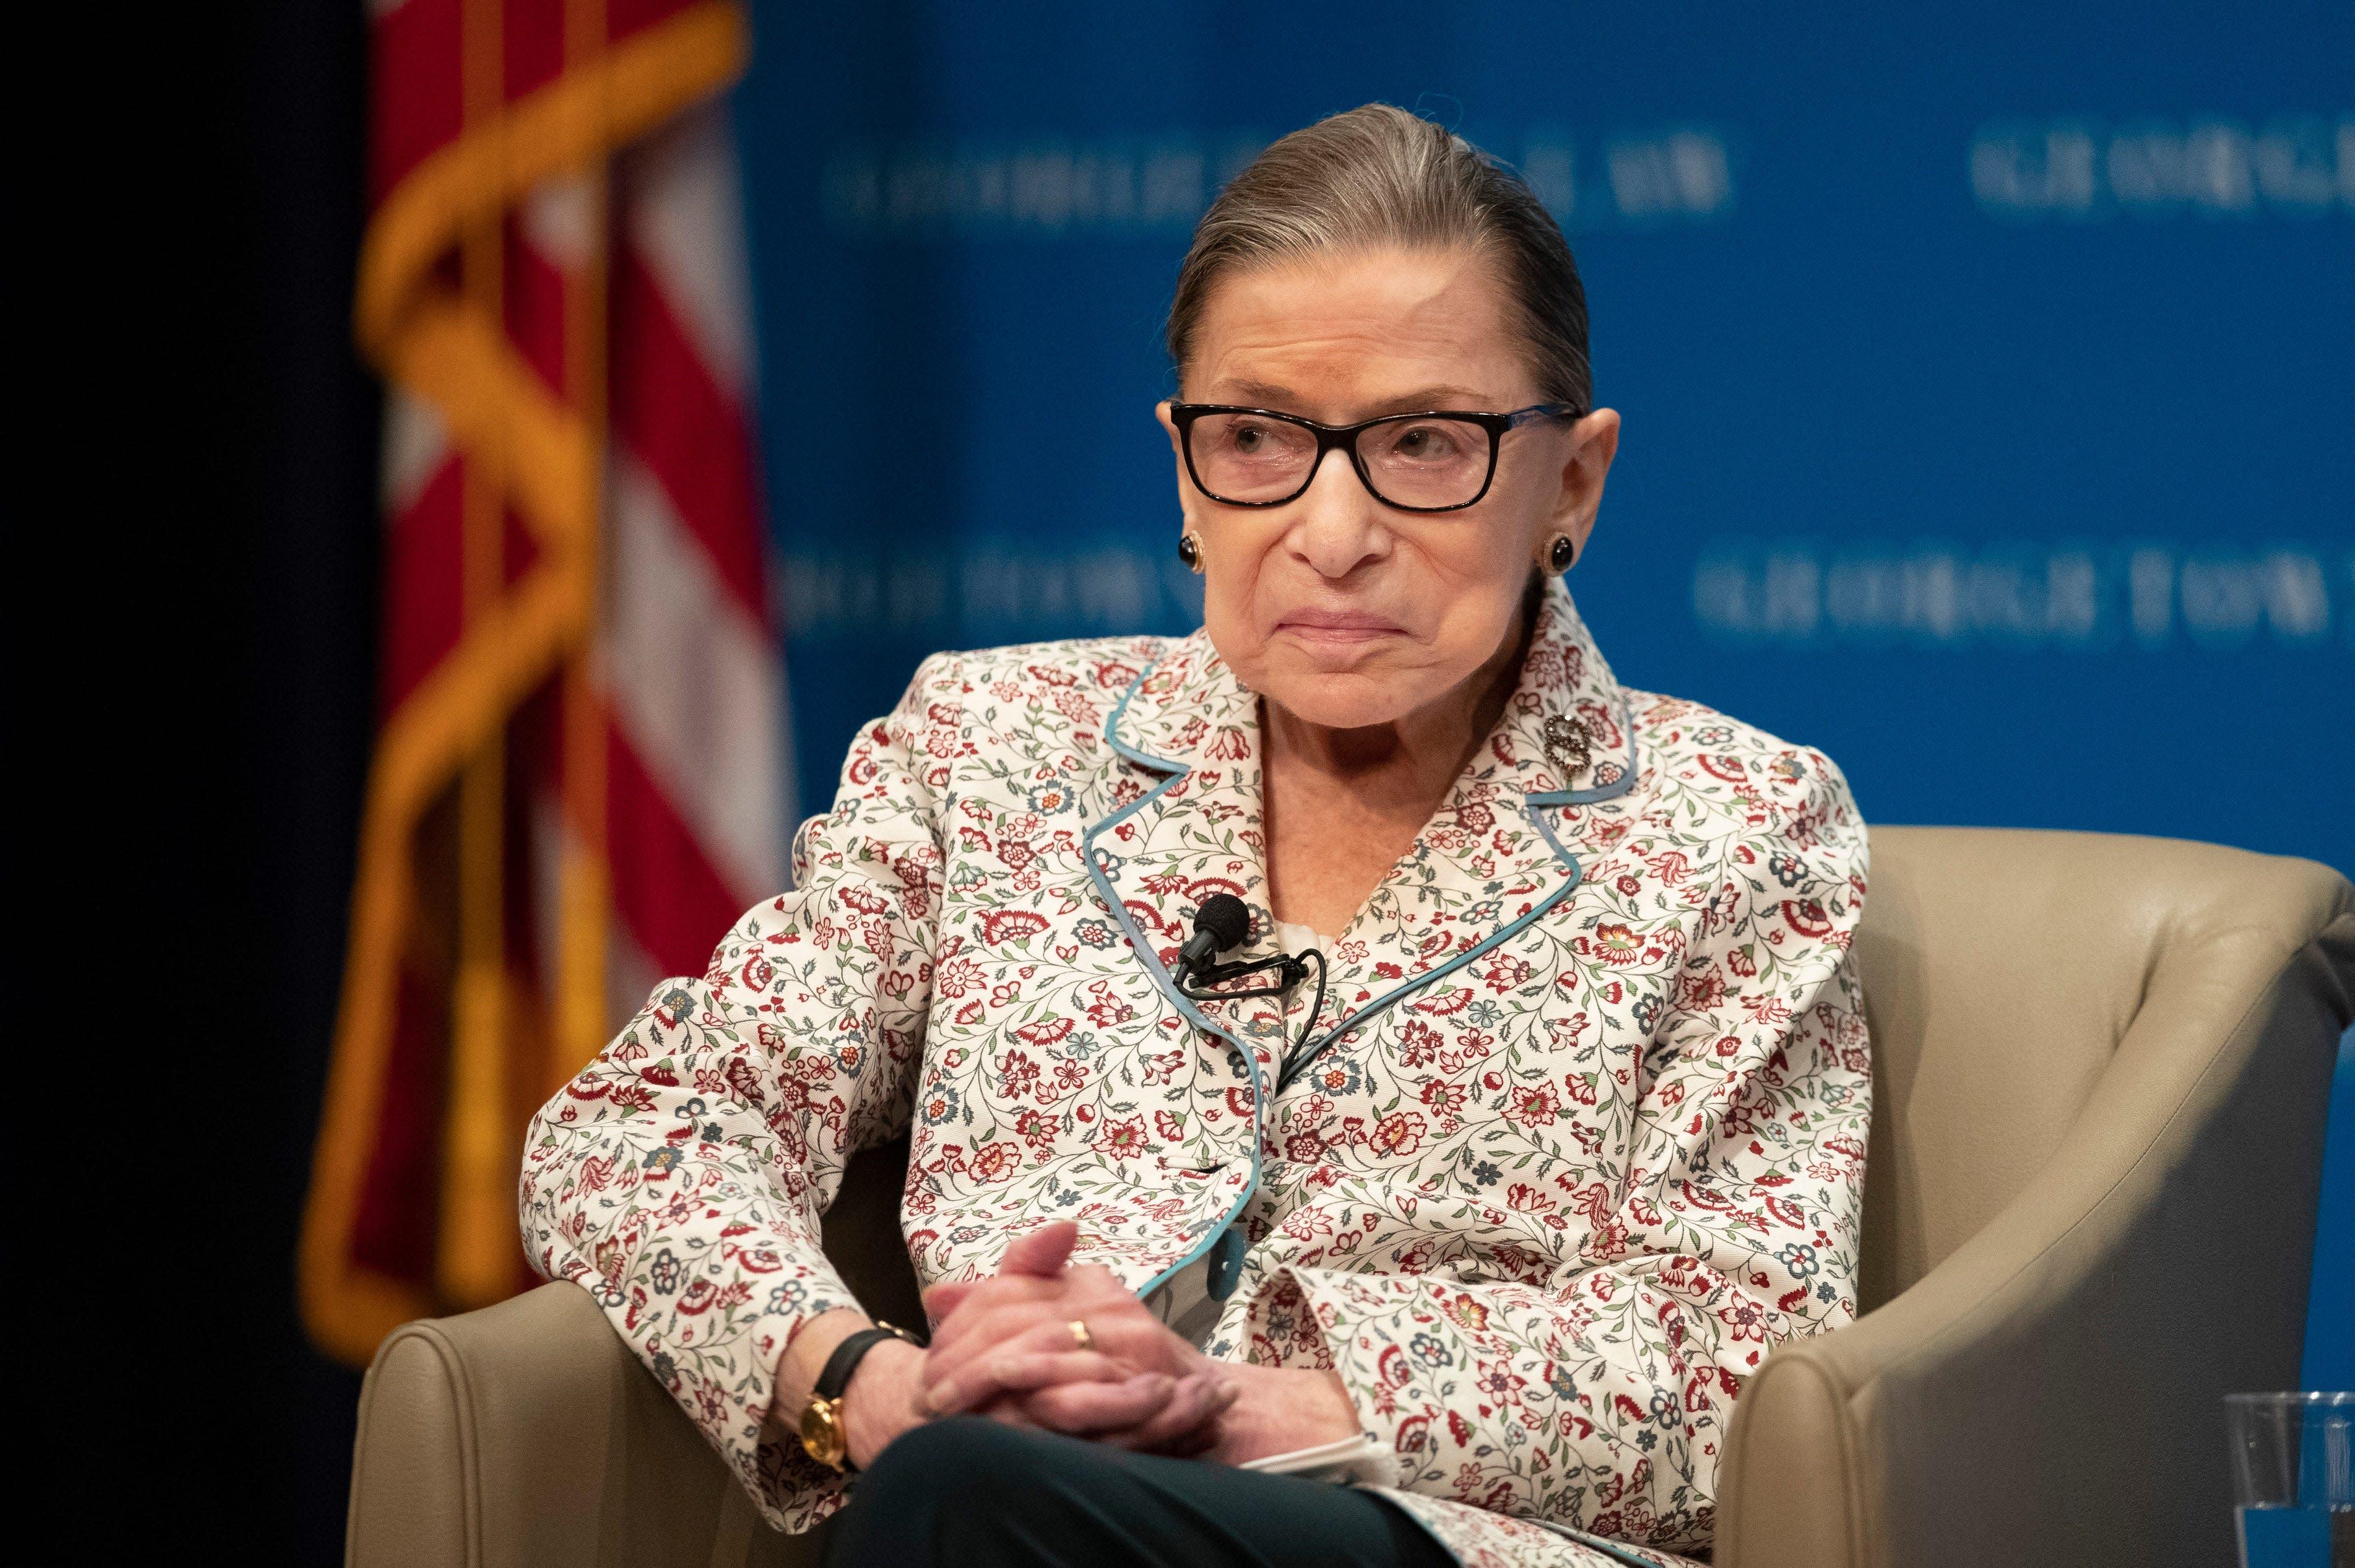 Justice Ruth Bader Ginsburg treated for malignant tumor on pancreas